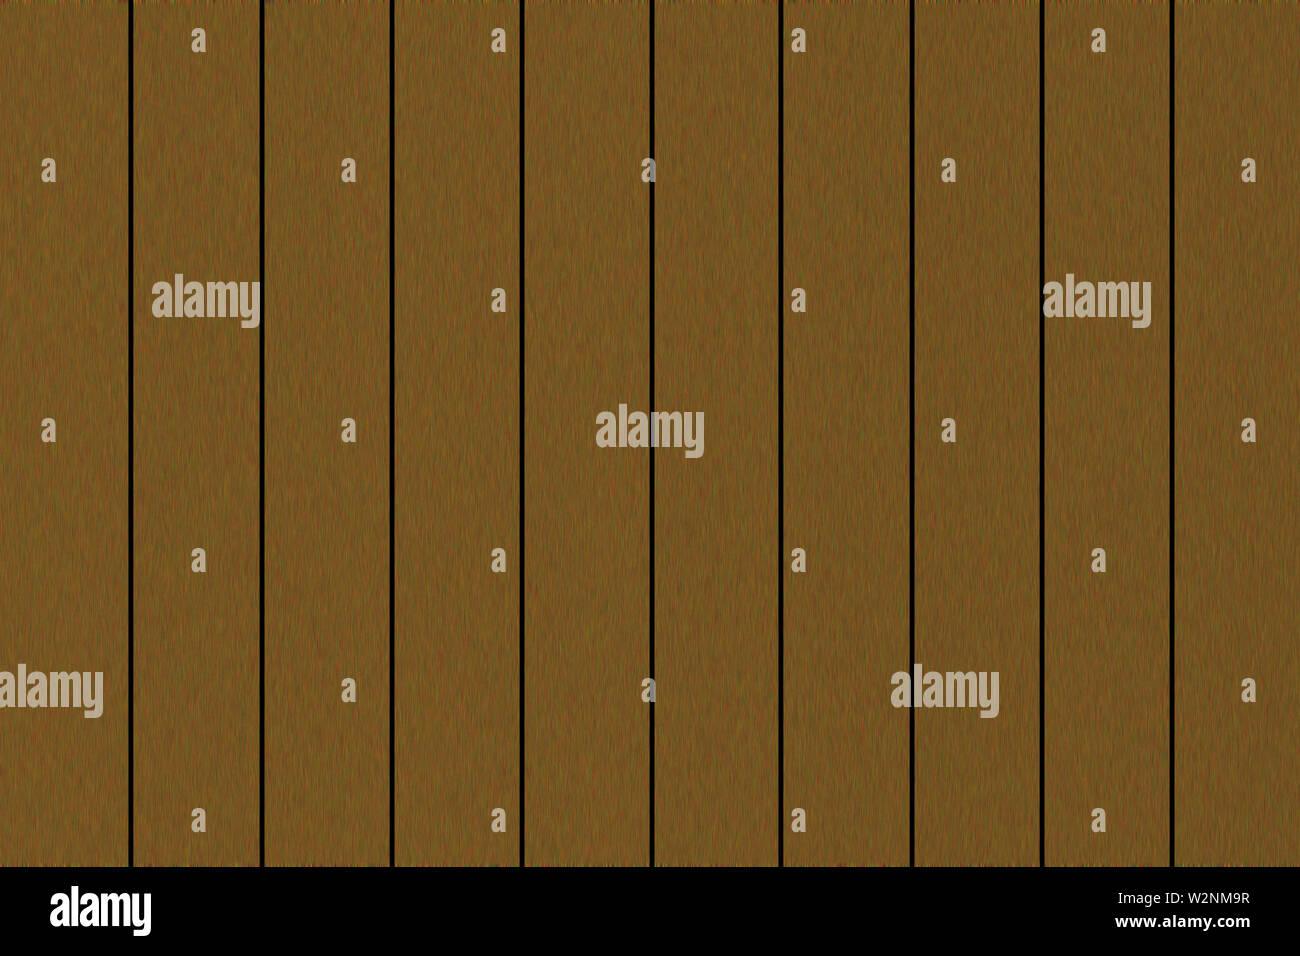 Illustration. Plate of imitation wood plank . Filled frame. - Stock Image